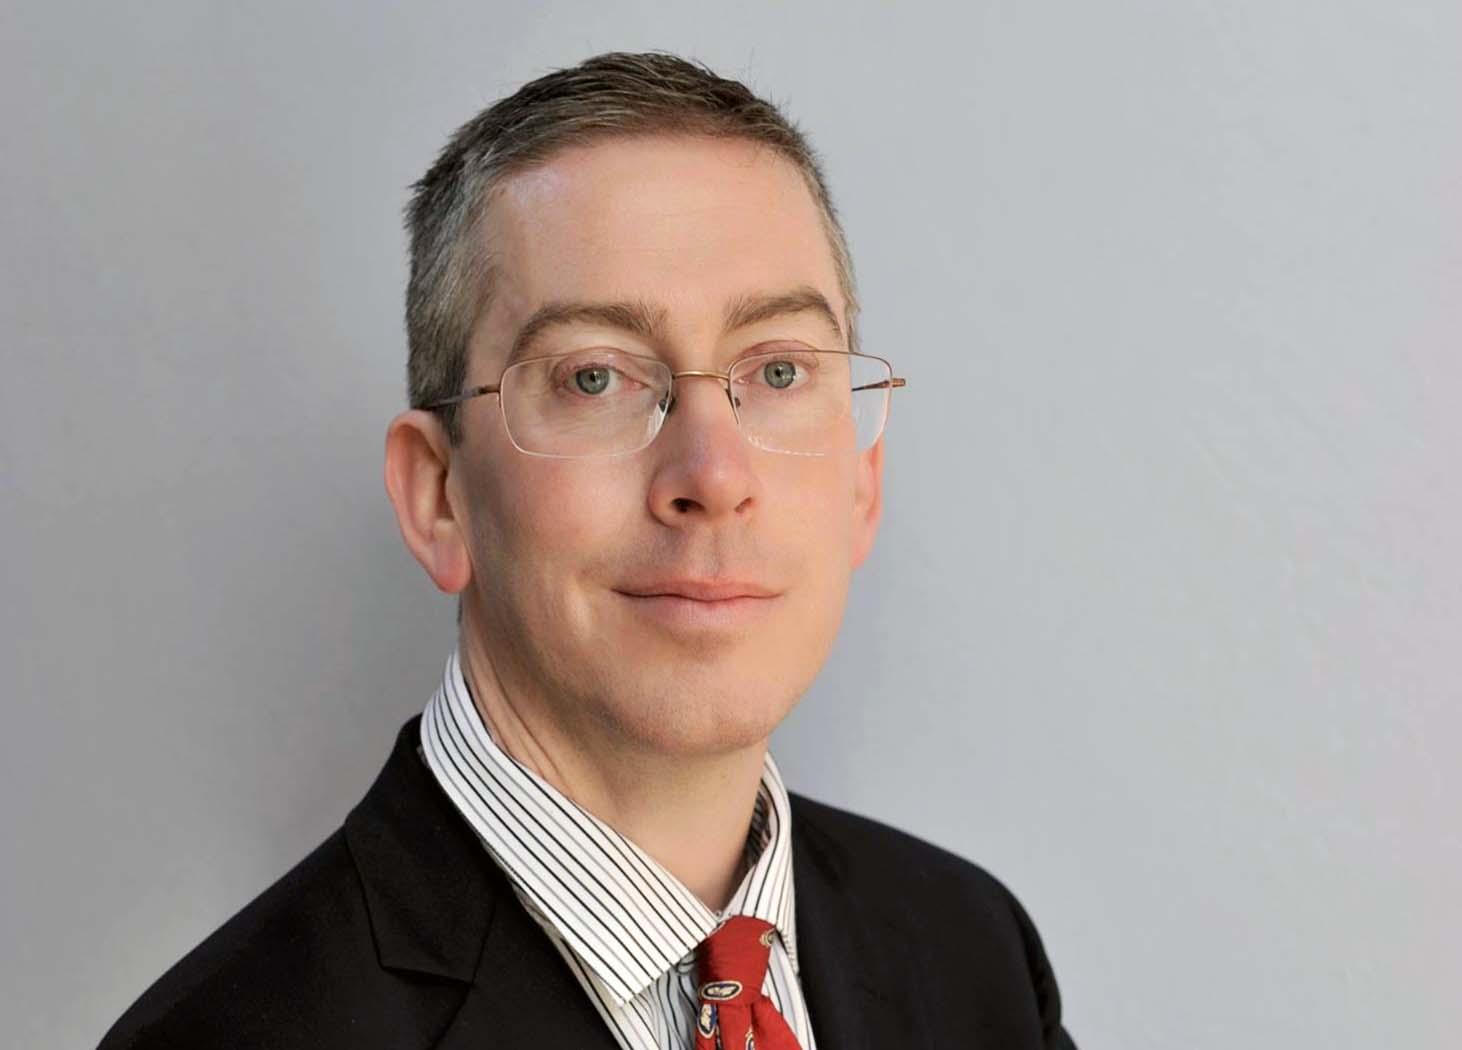 Portrait of Bryan Caplan